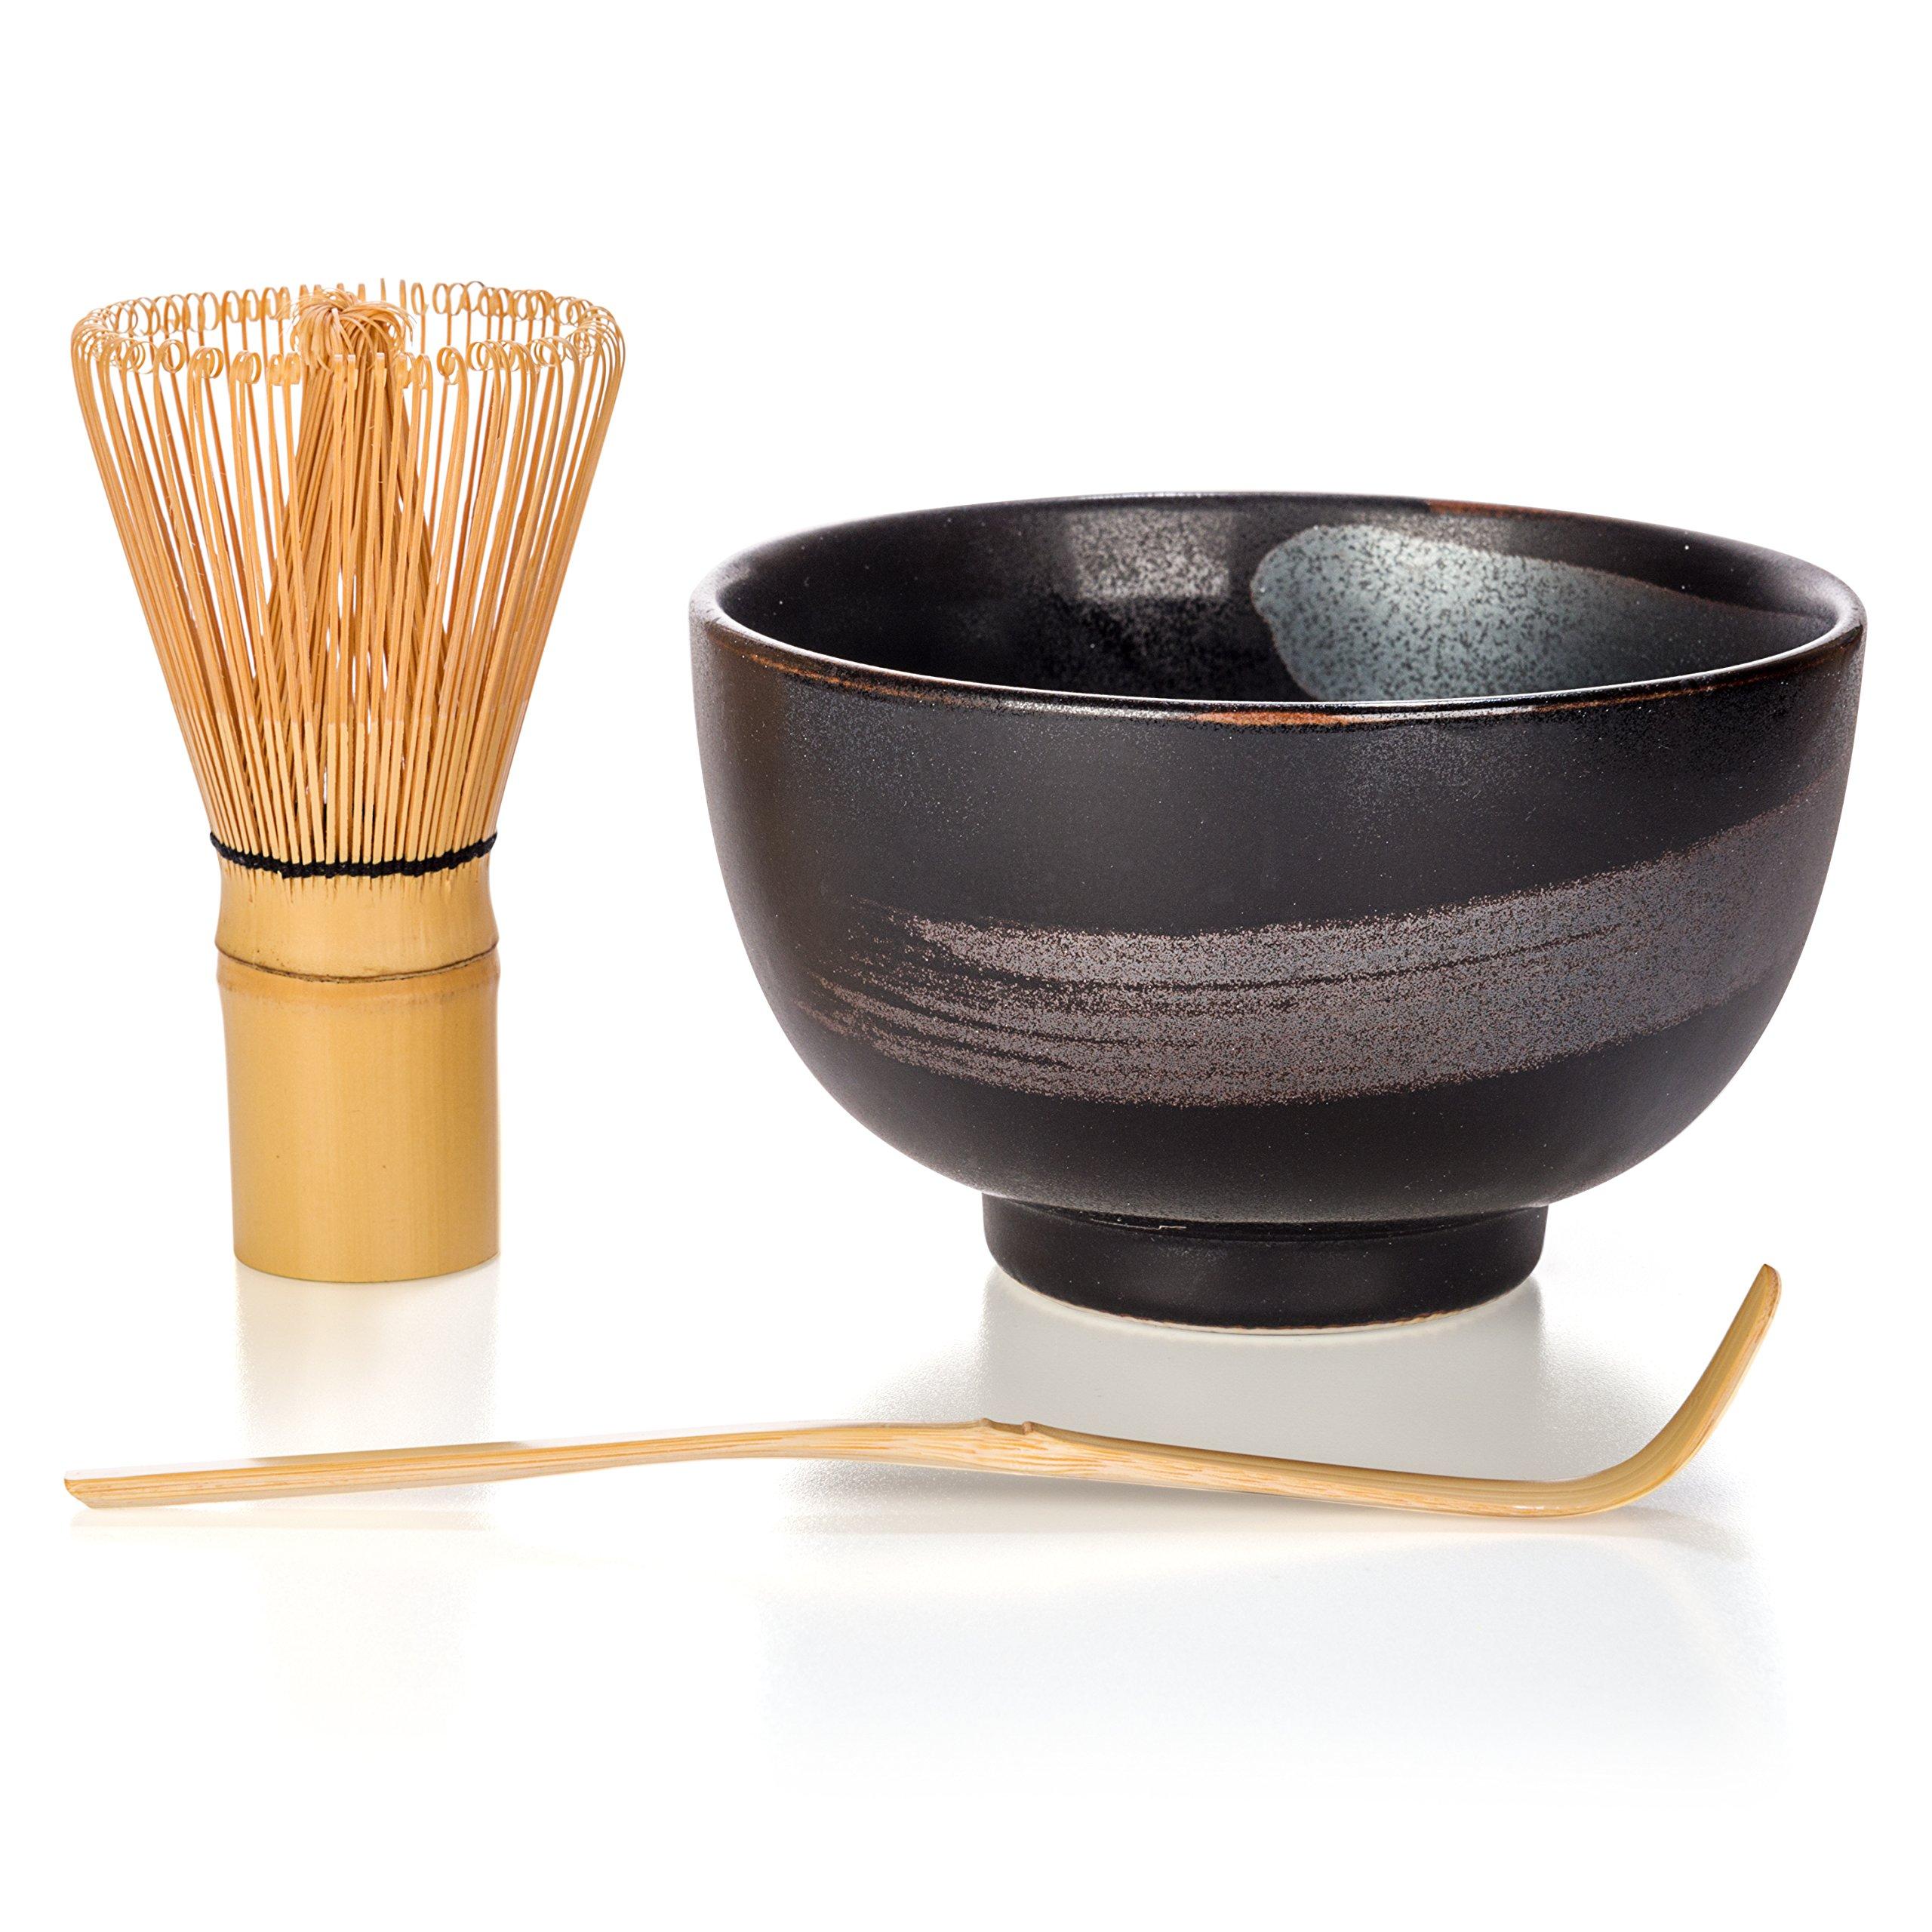 Tealyra - Matcha - Start Up Kit - 3 items - Matcha Green Tea Gift Set - Japanese Made Black Bowl - Bamboo Whisk and Scoop - Gift Box